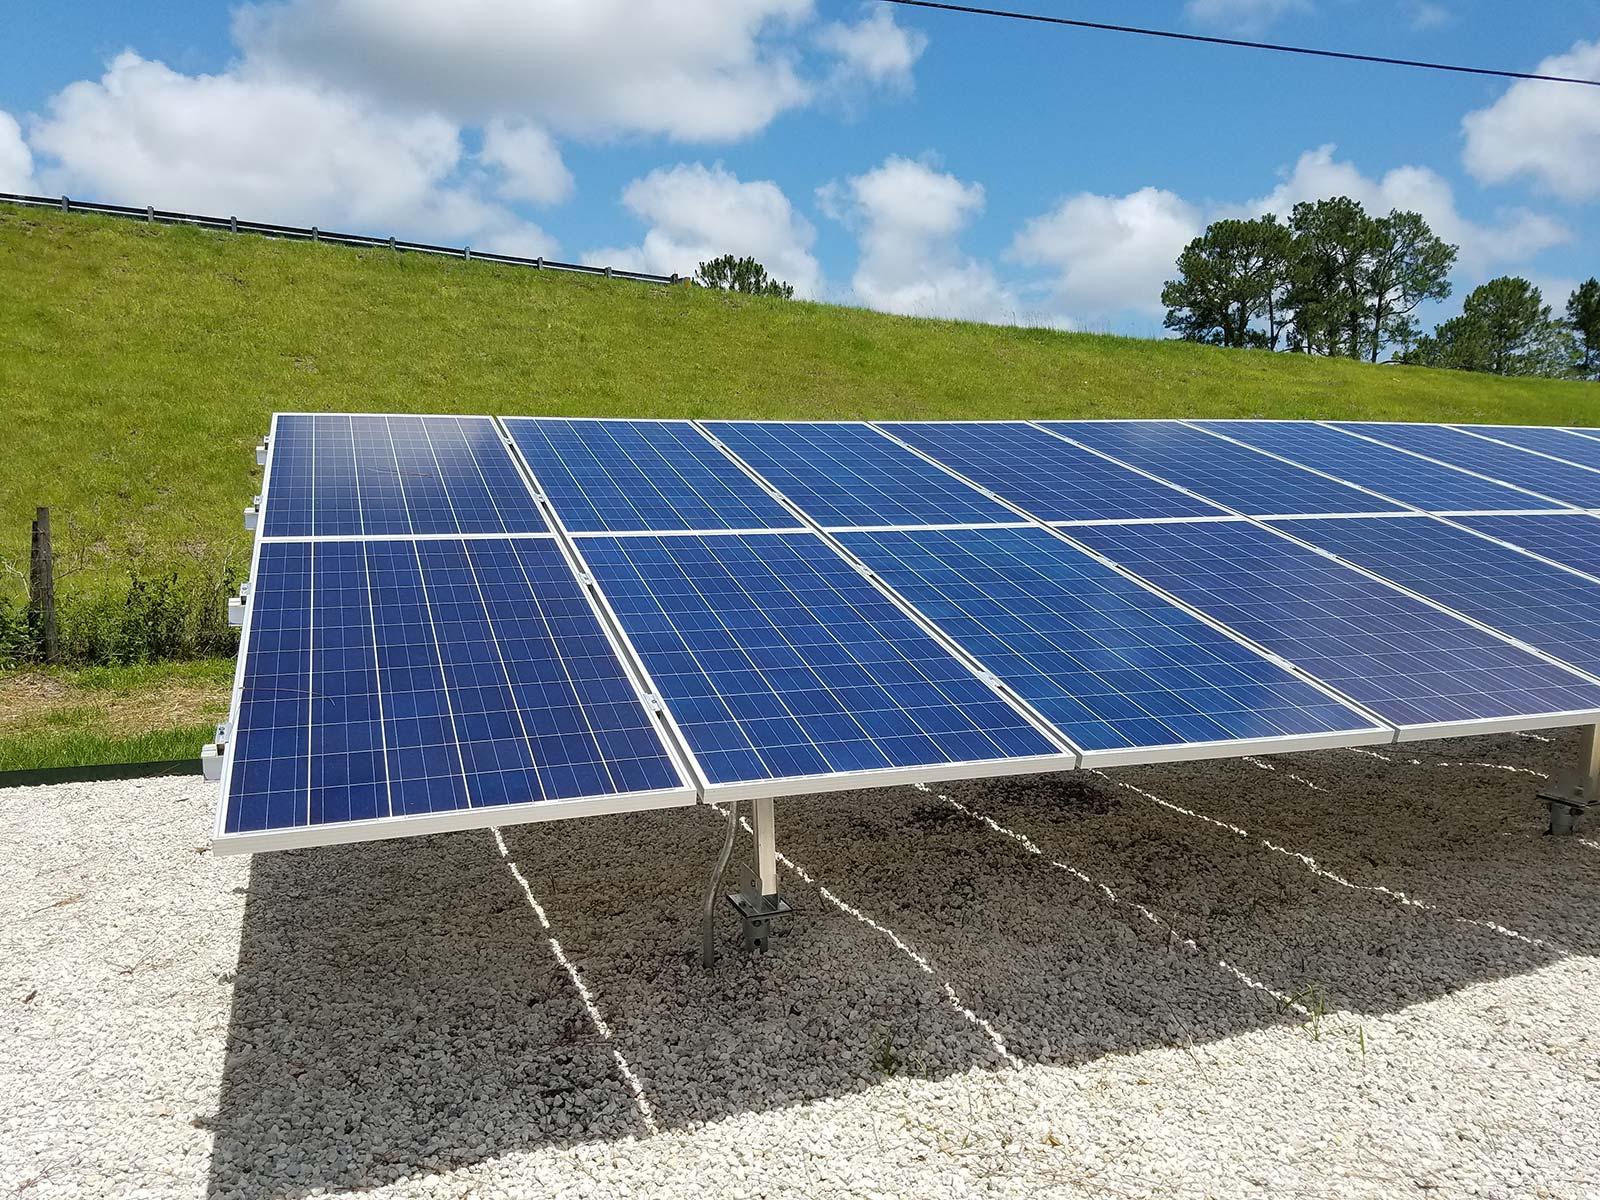 Ground Mount Vs. Roof Mount Solar Panels: Understanding 6 Differences